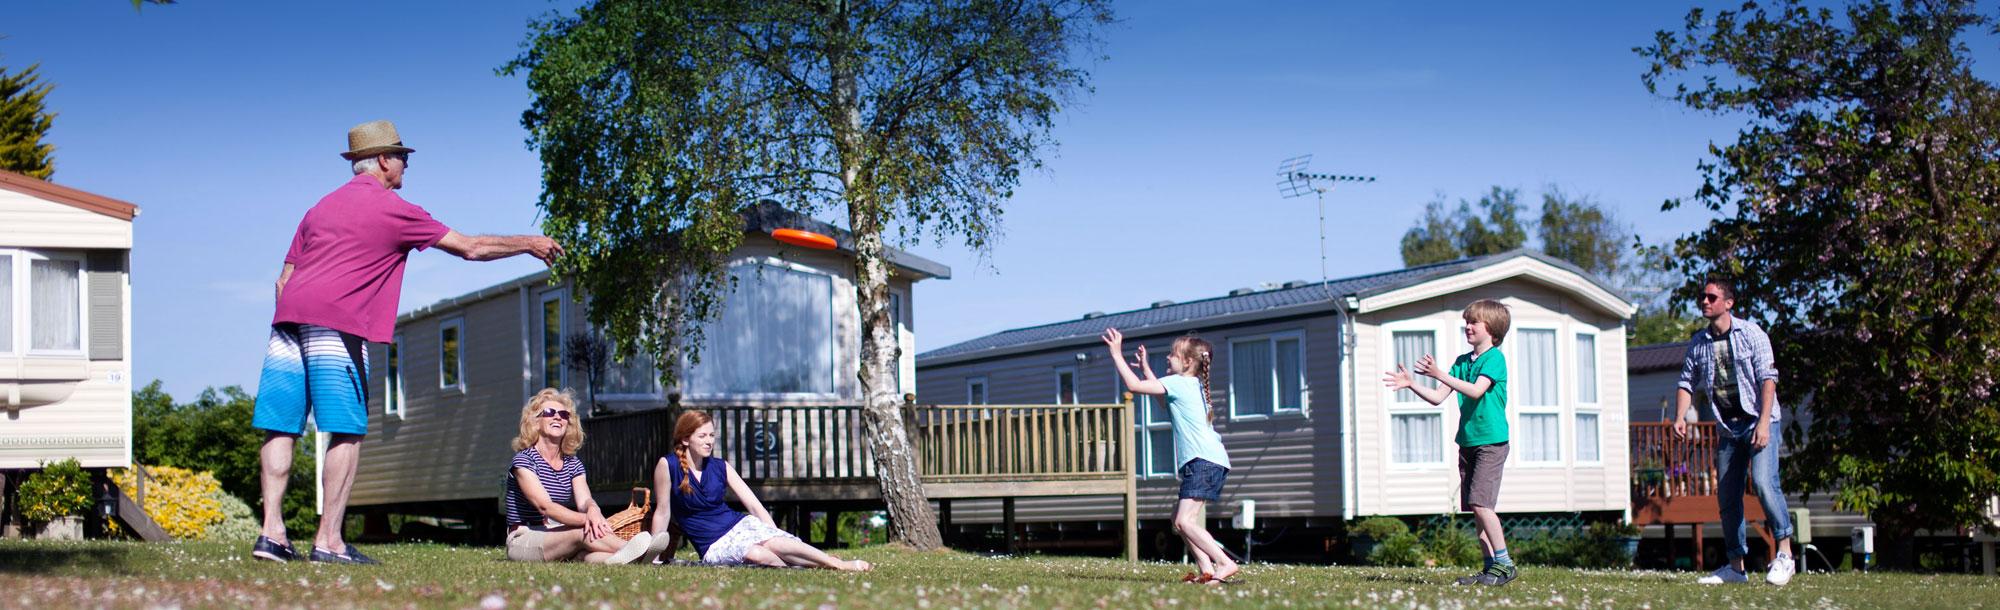 Caravan holidays Essex - Waldegraves holiday park